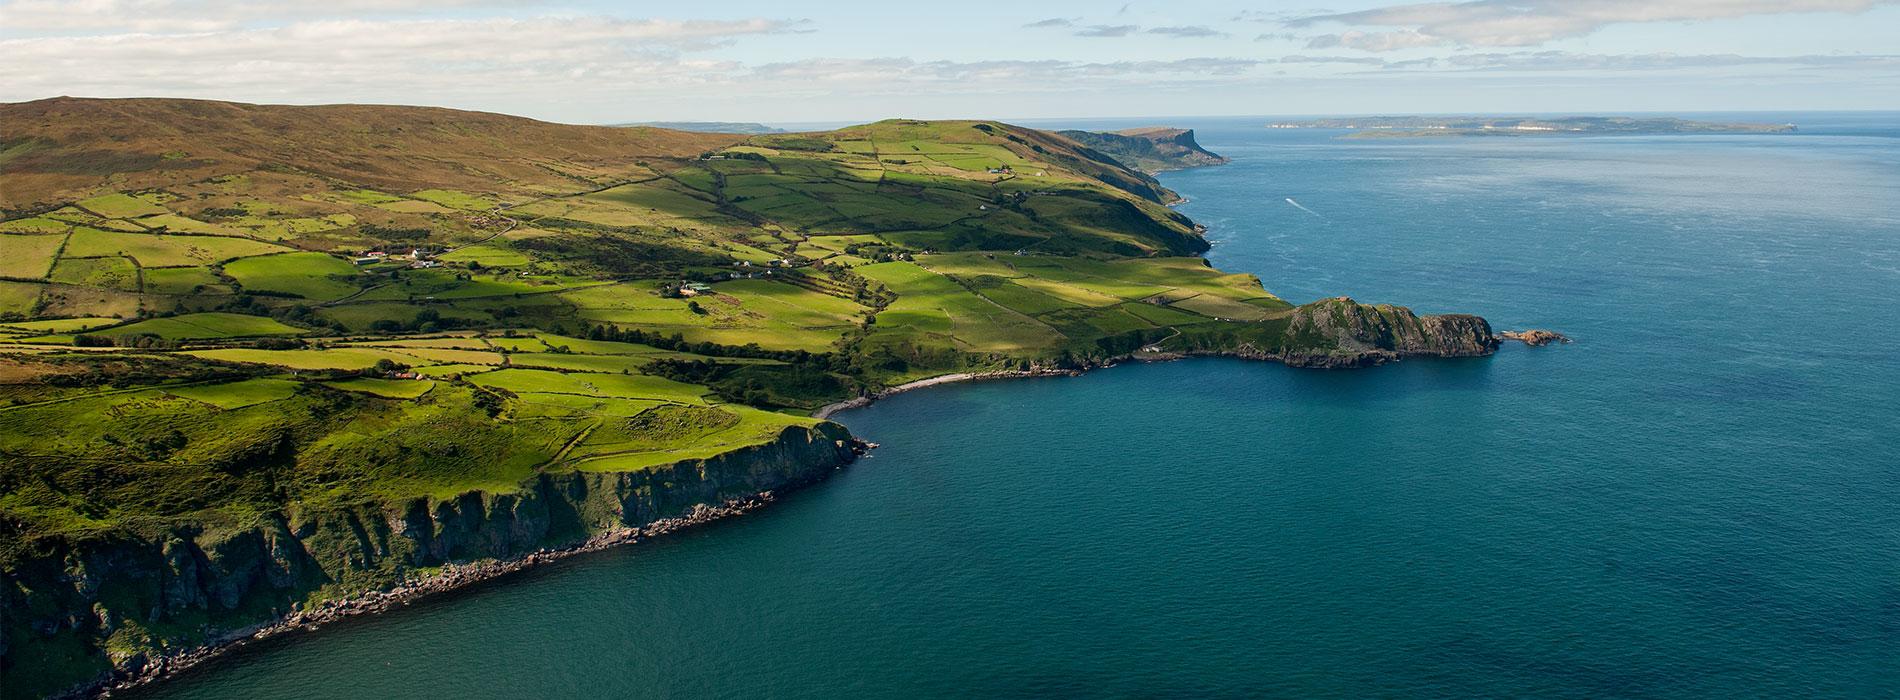 Discover Northern Ireland's Causeway Coast